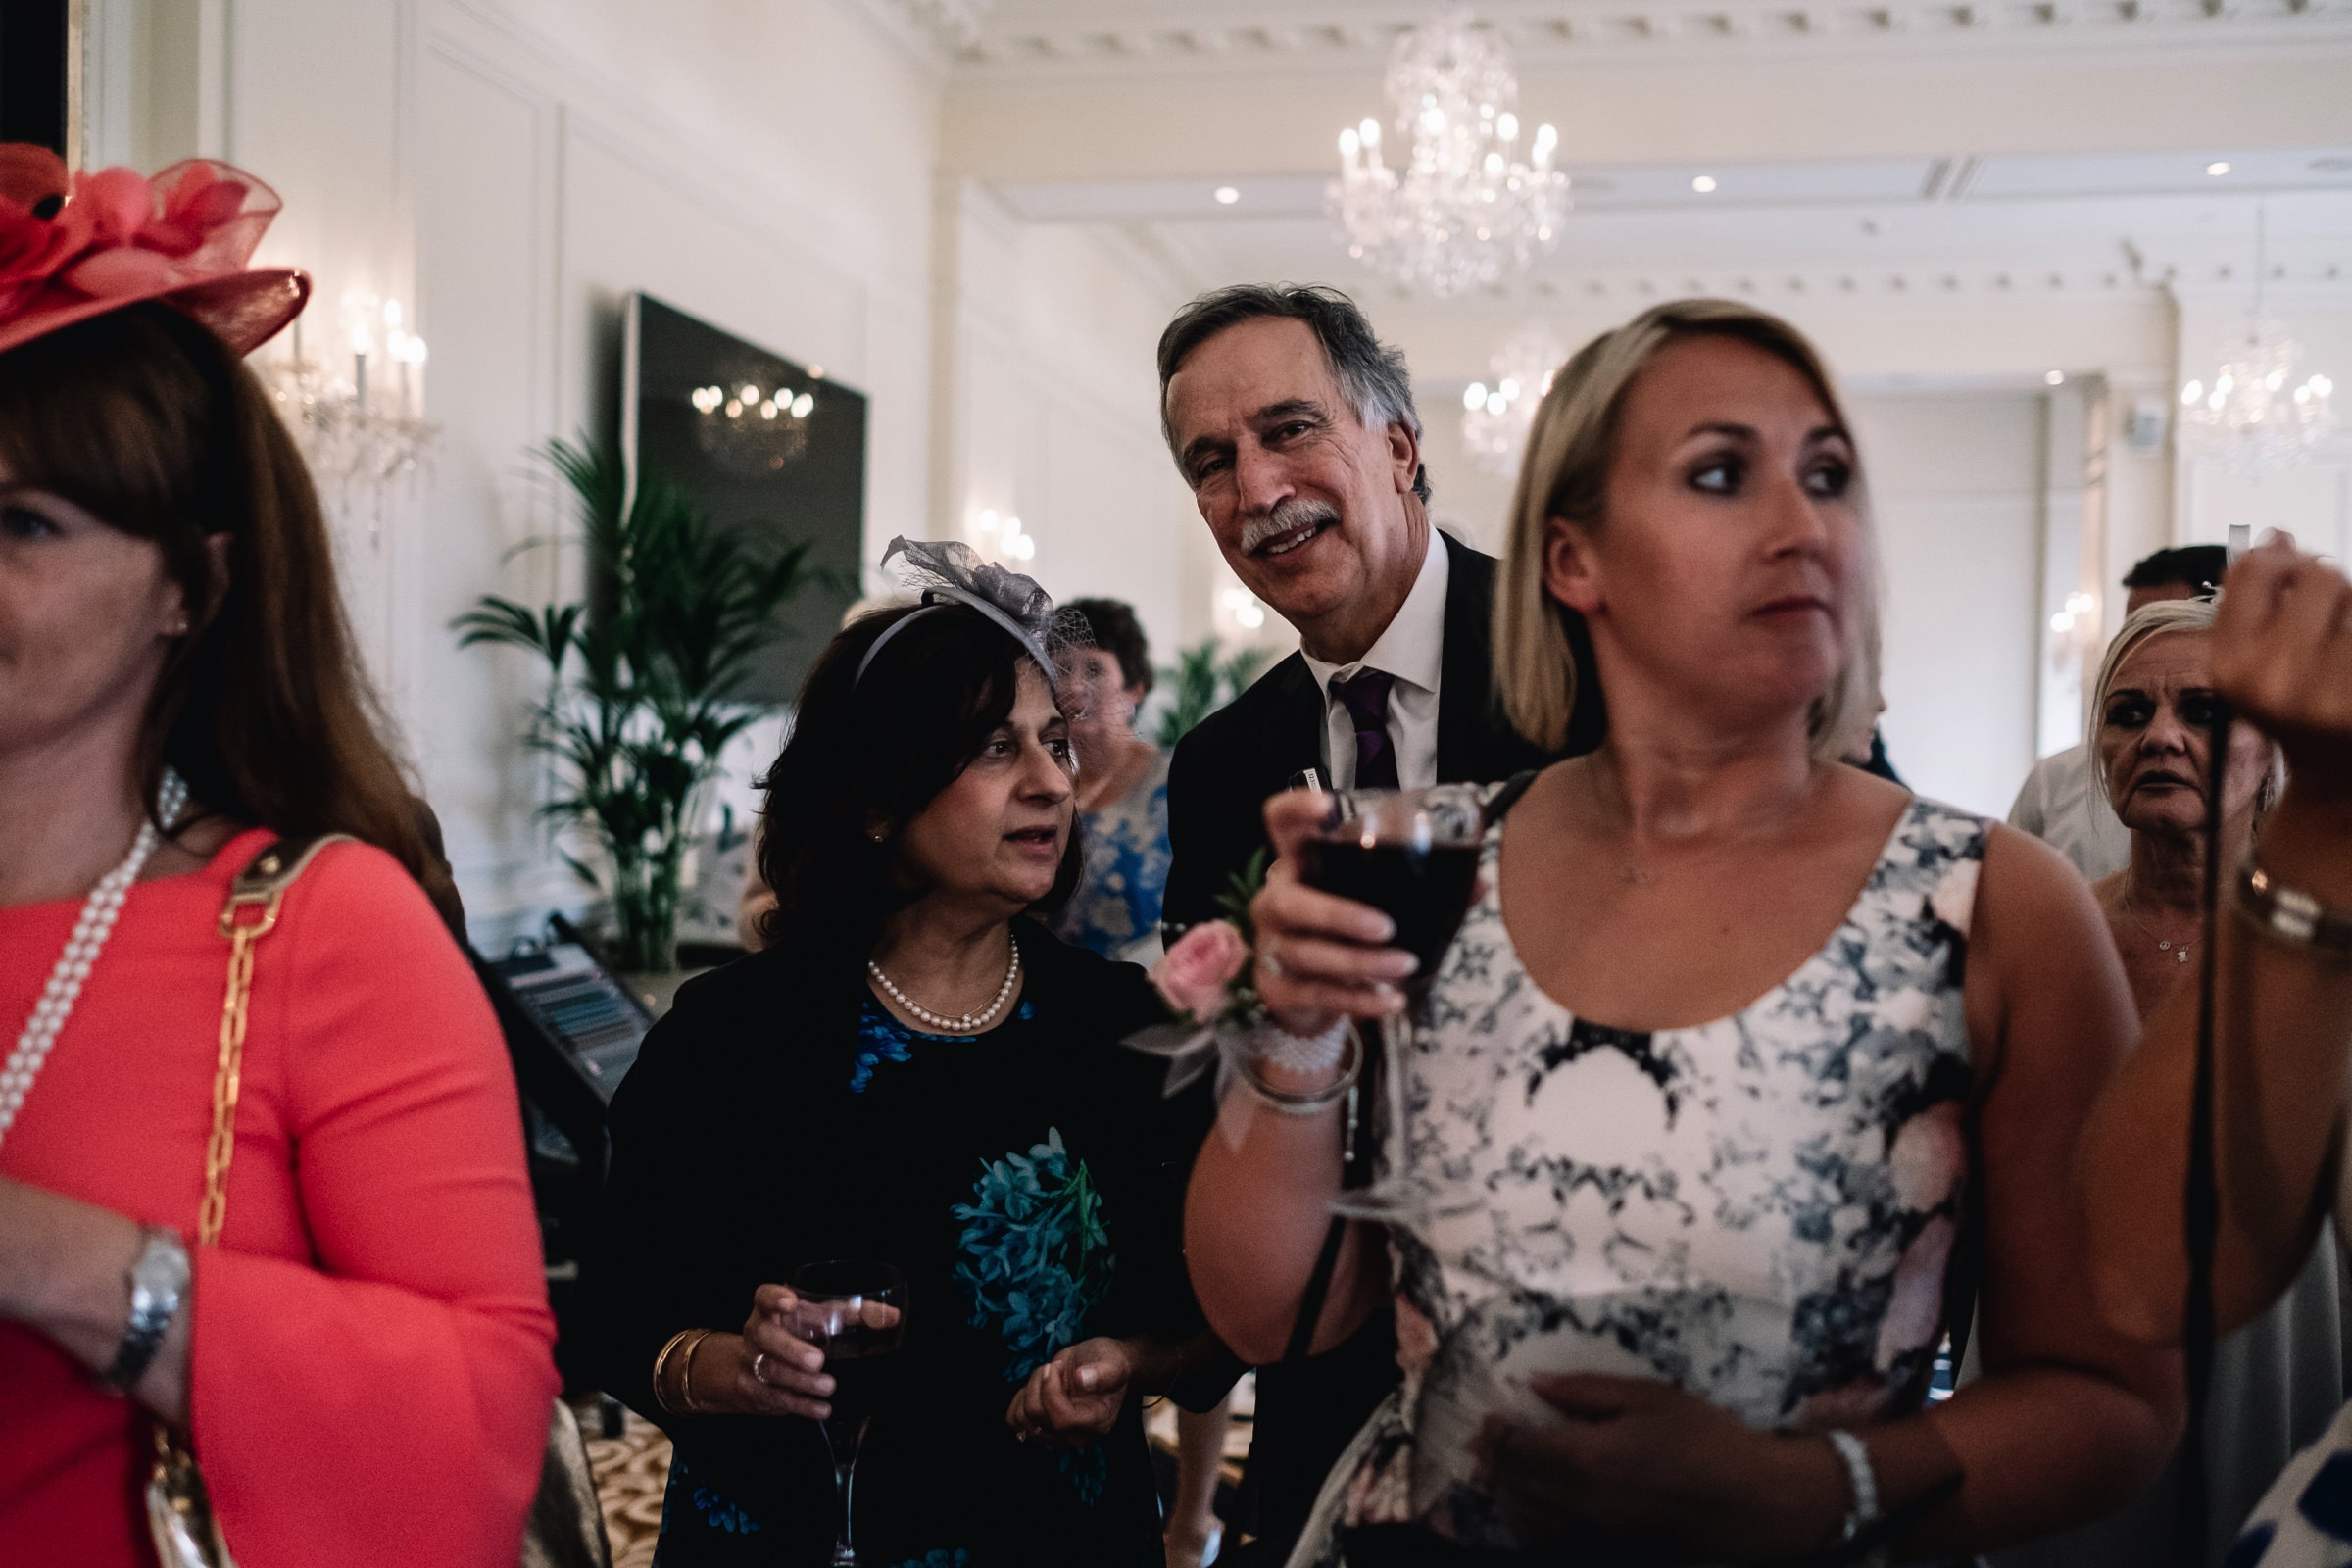 Guests watch cake cutting